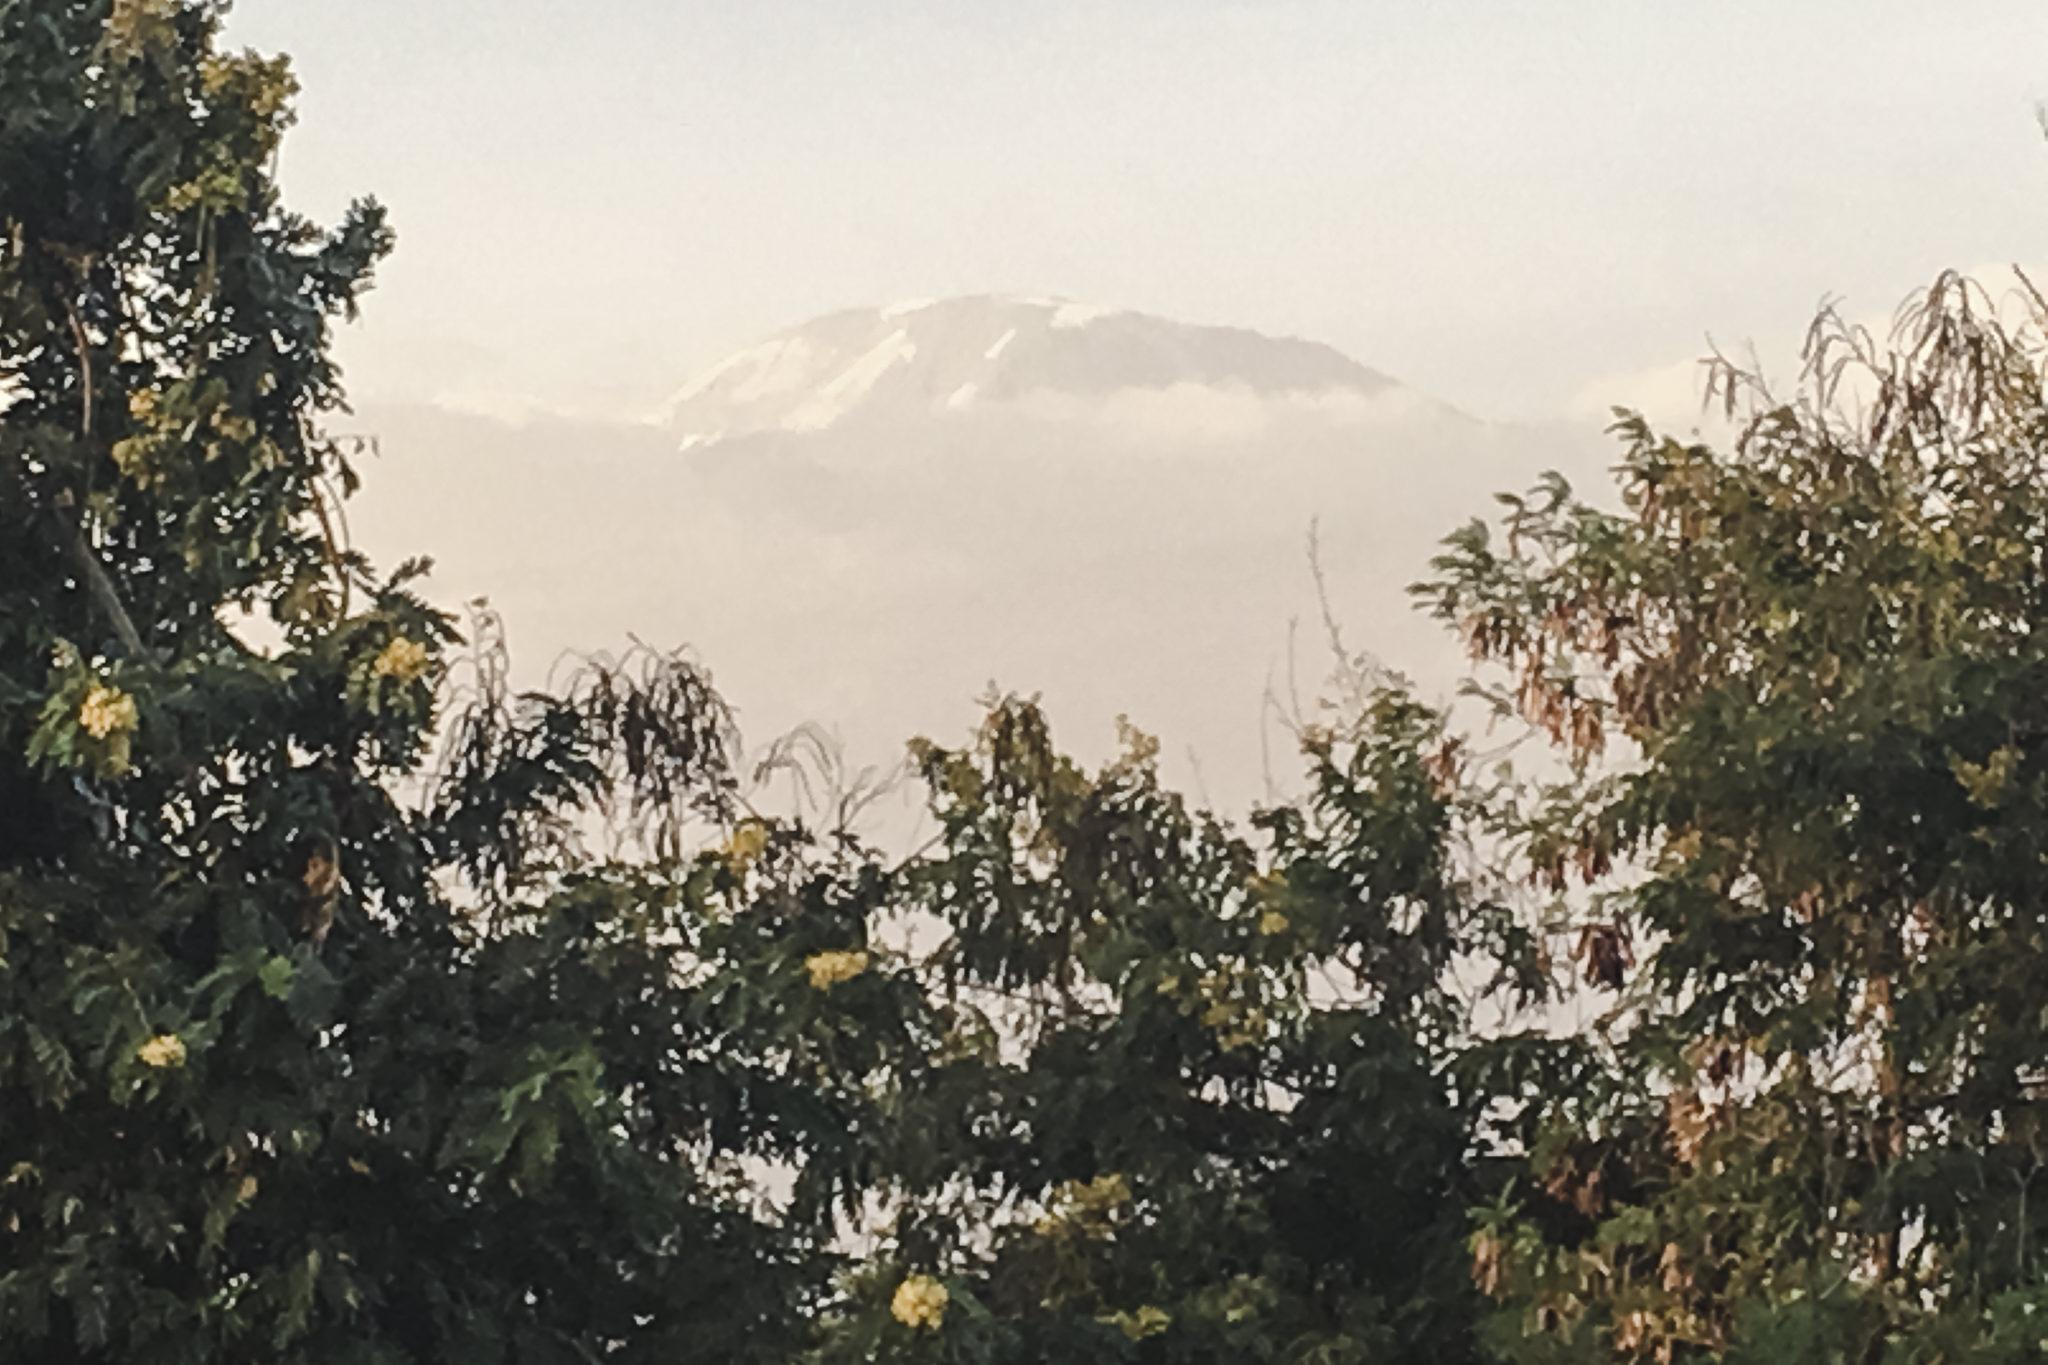 Kilimanjaro - 13